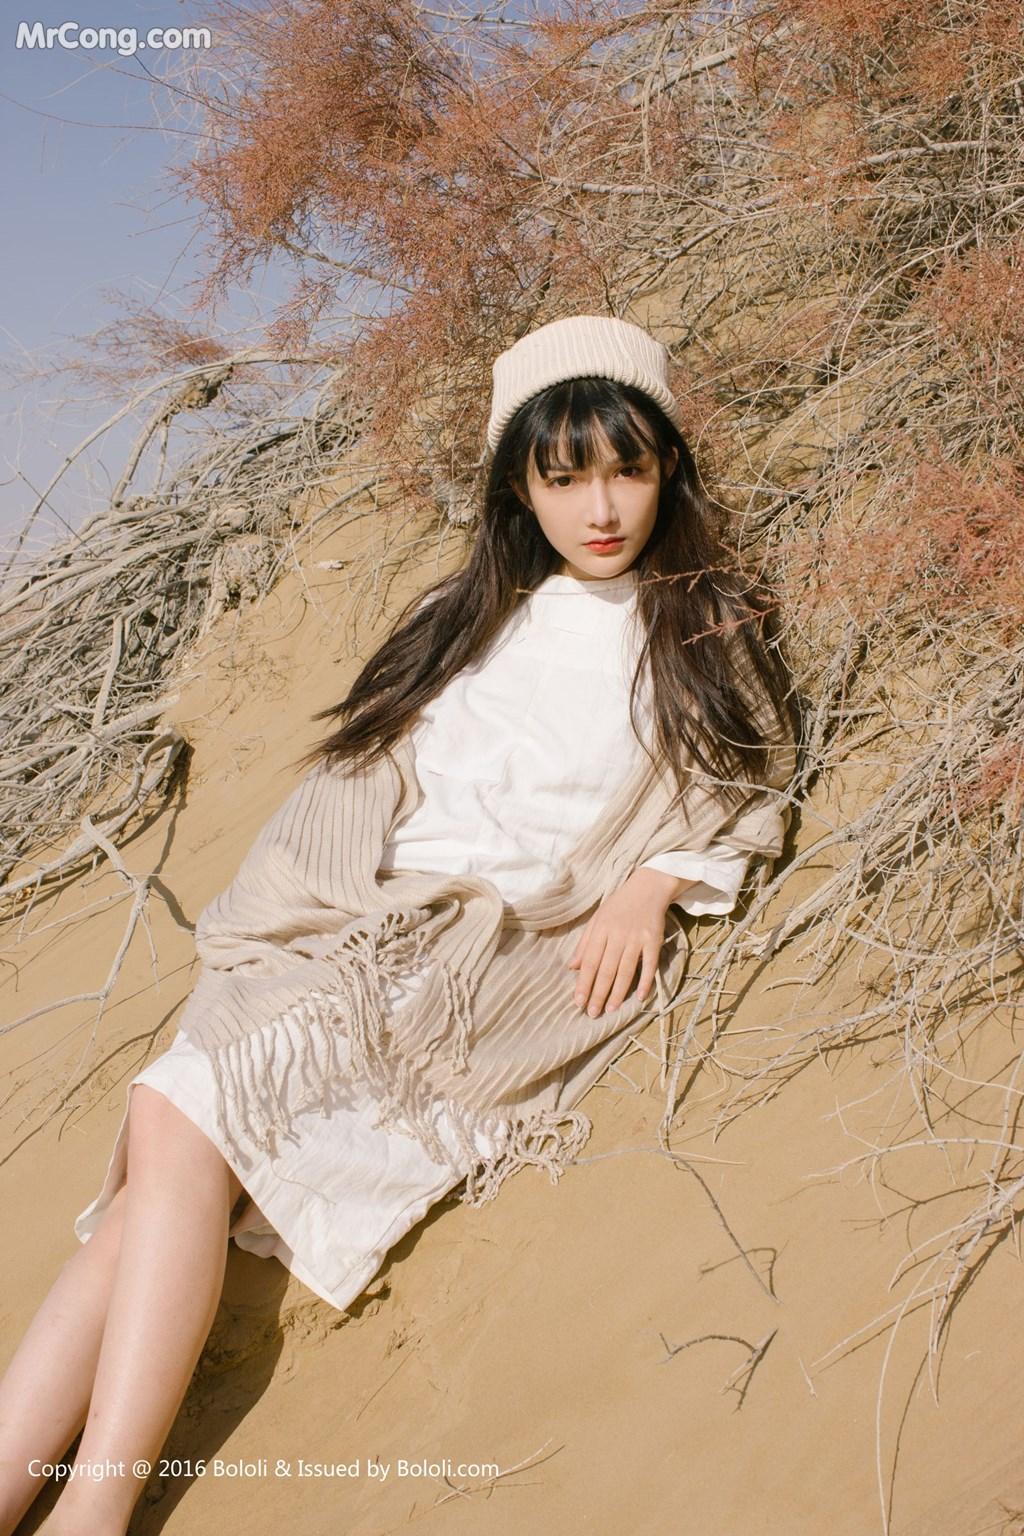 Image Tukmo-Vol.102-Zhi-Ying-MrCong.com-008 in post Tukmo Vol.102: Người mẫu Zhi Ying (之应) (41 ảnh)